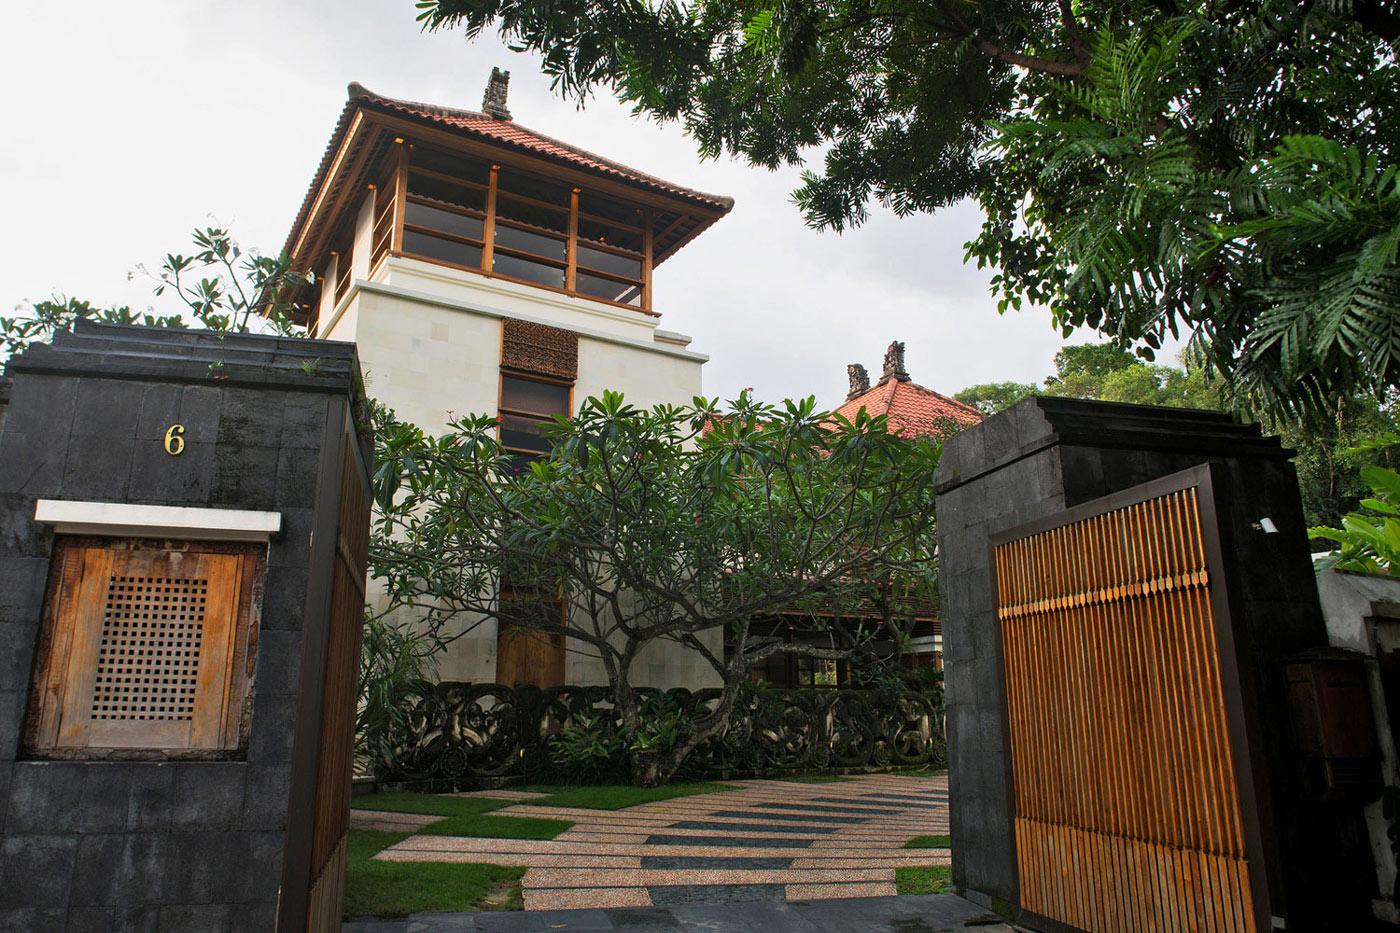 Entrance, Gates, Home in Kuala Lumpur, Malaysia